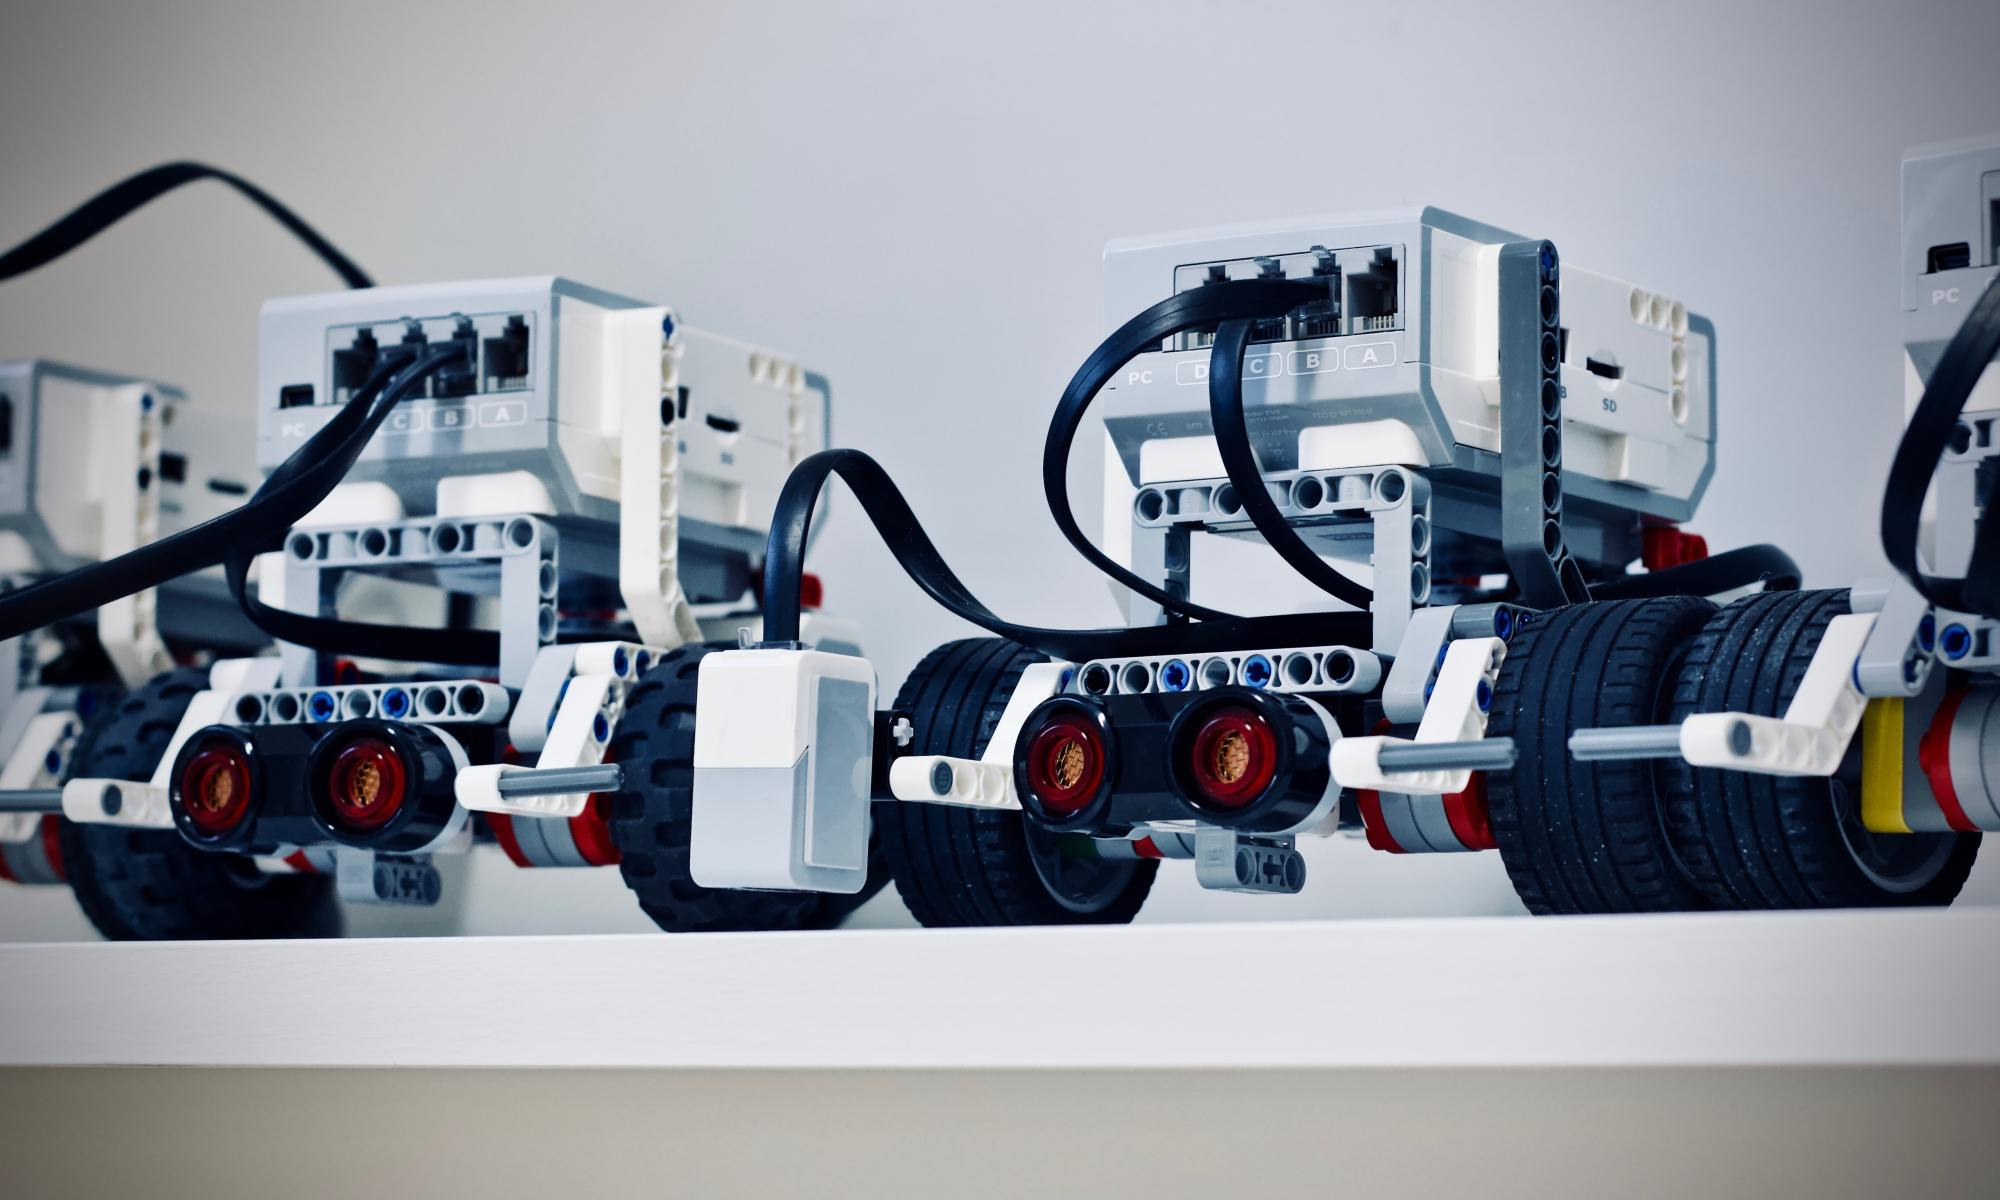 How to Become a Robotics Software Engineer